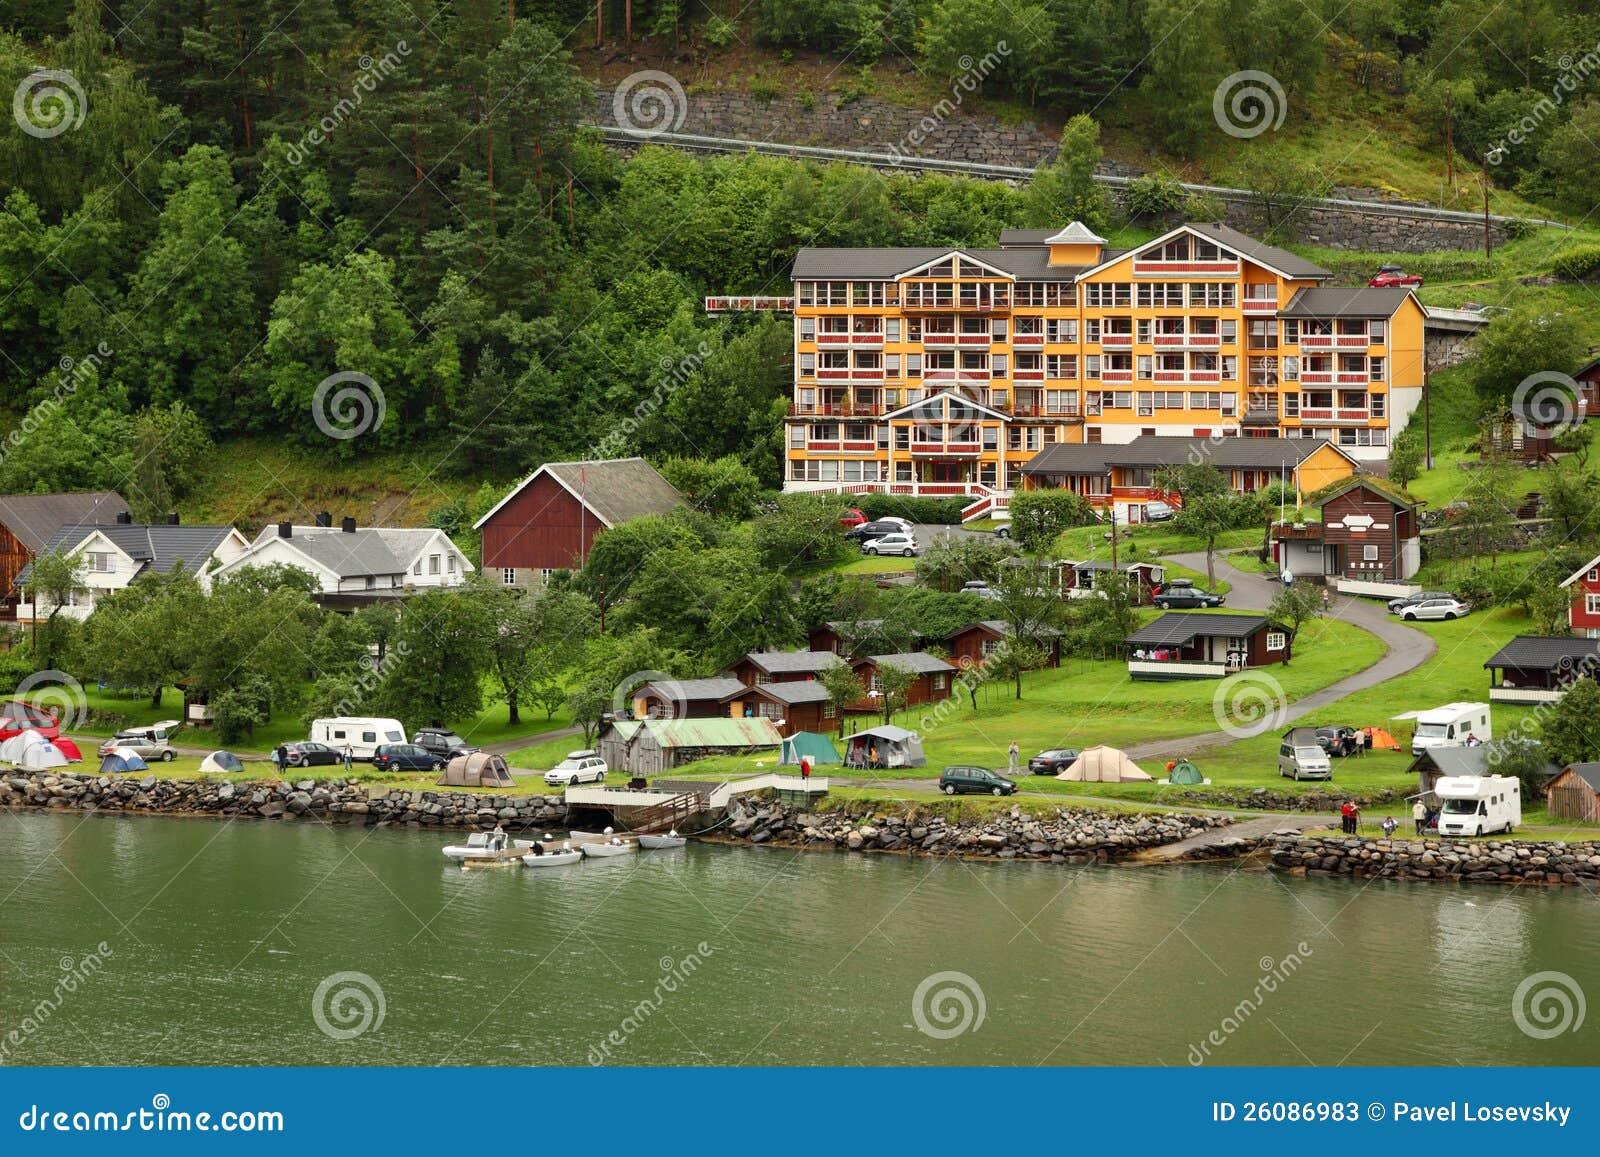 Grande Fjord Hotel In Small Coastal Village Editorial Stock